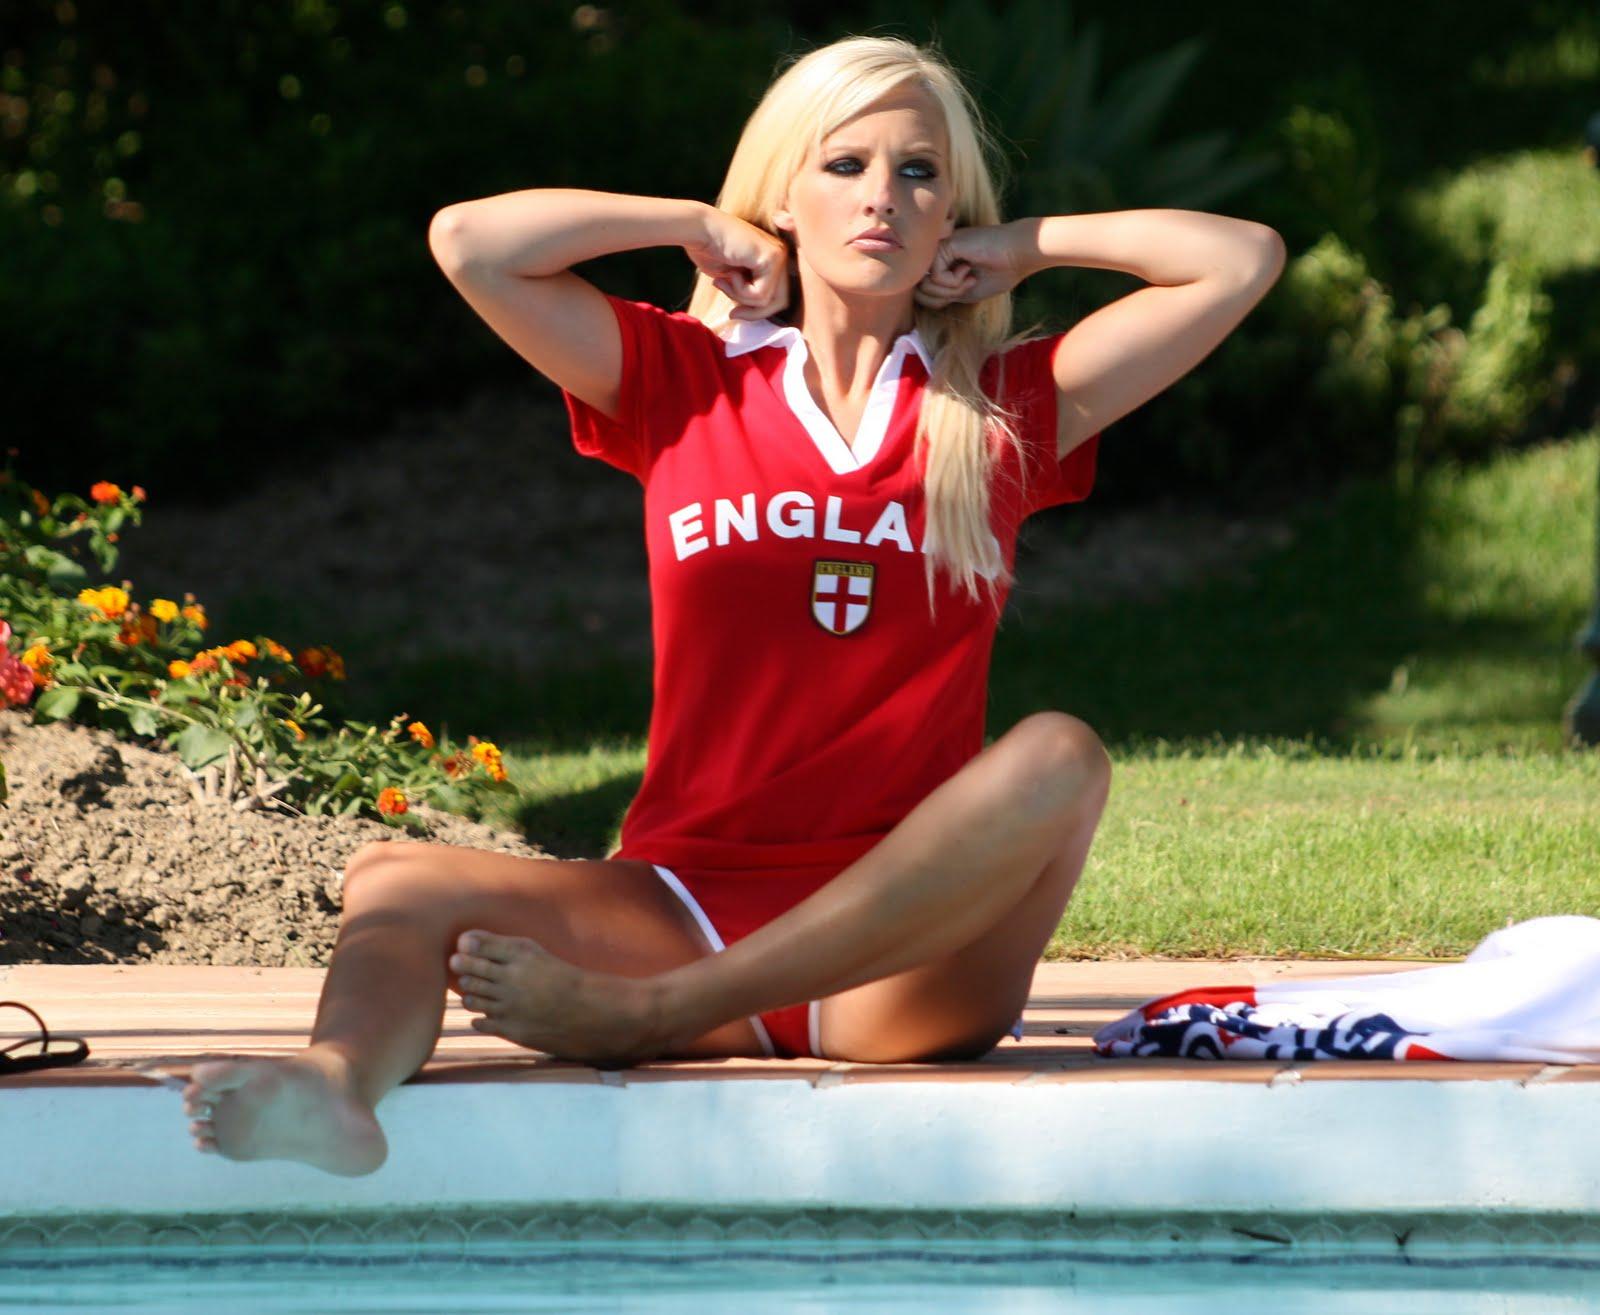 female celebrity michelle marsh - photo #49